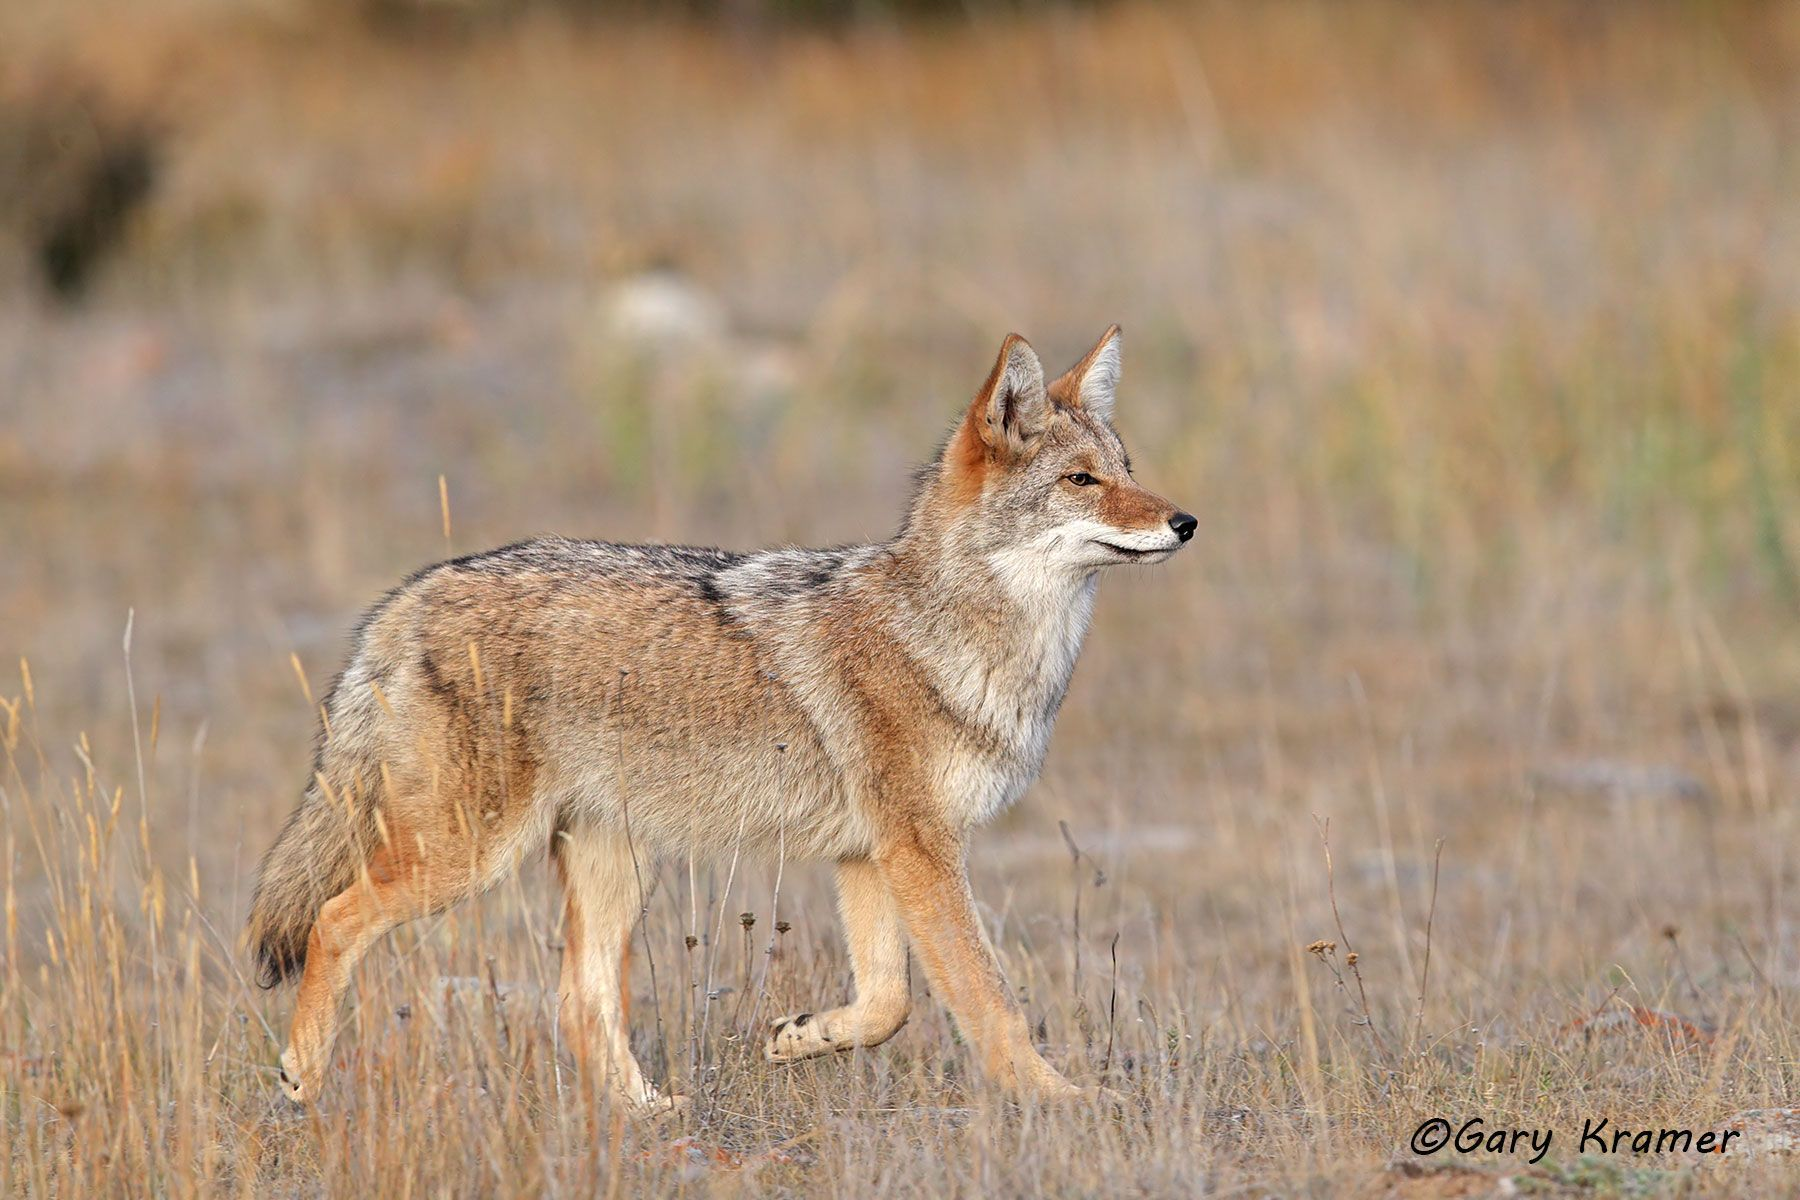 Coyote (Canis latrans) - NMC#1146d